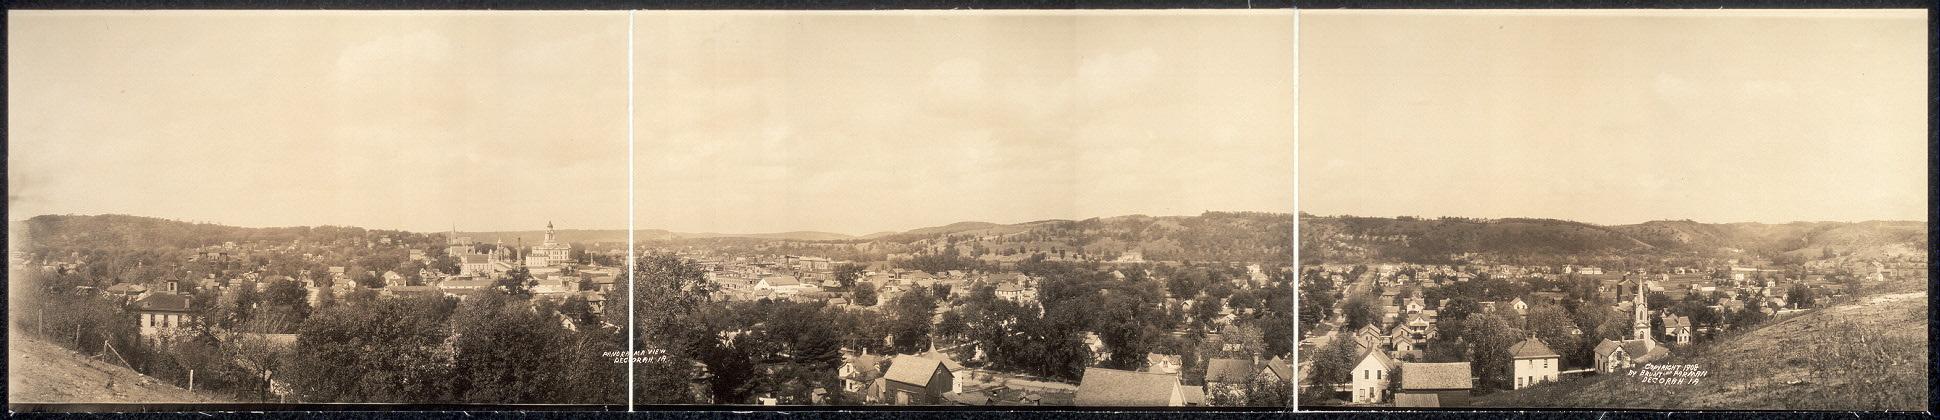 Decorah, Iowa 1908